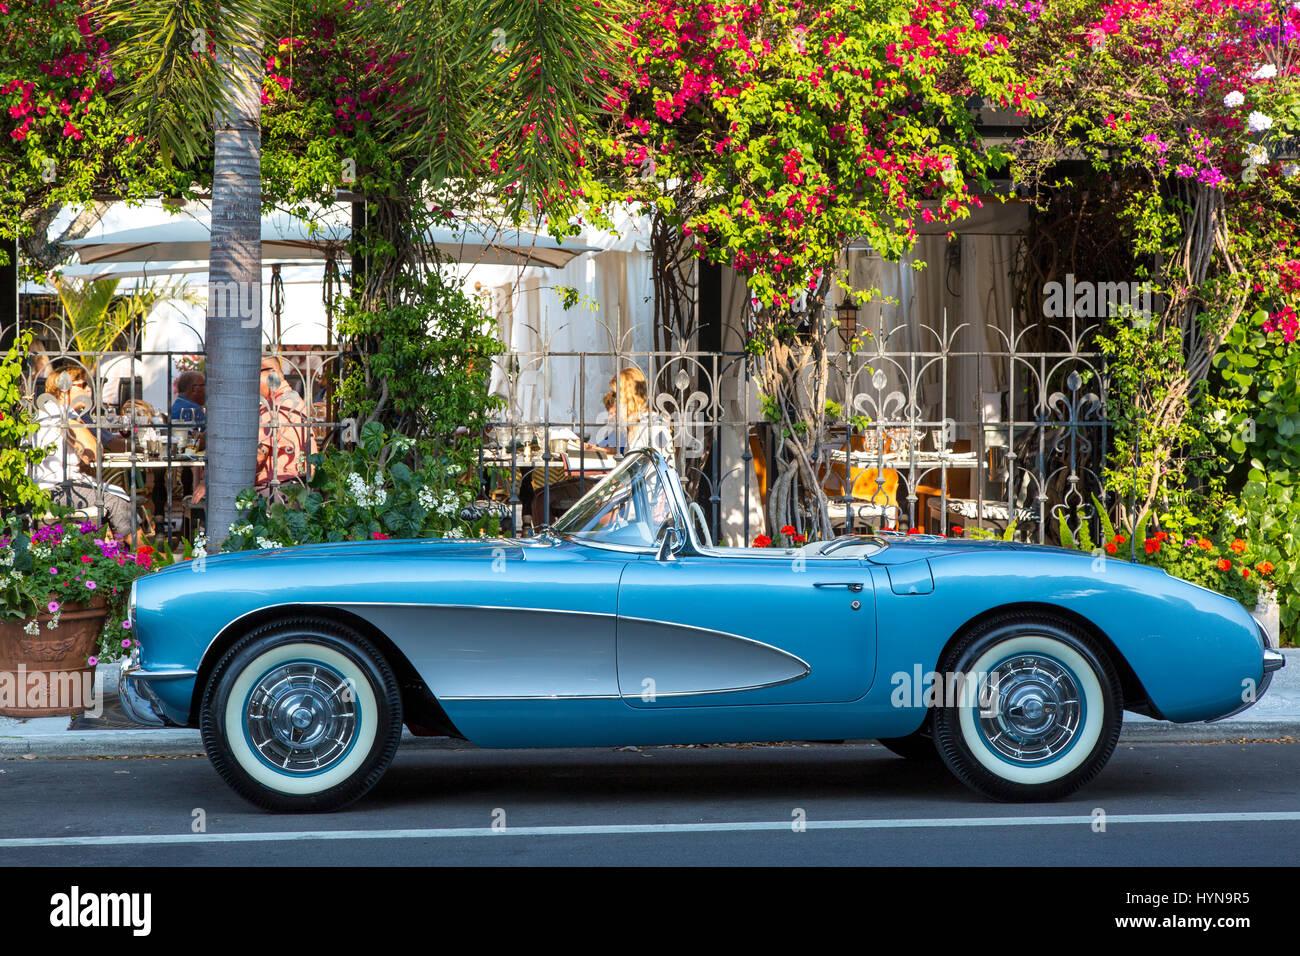 1957 chevrolet corvette stingray parked in downtown naples florida usa